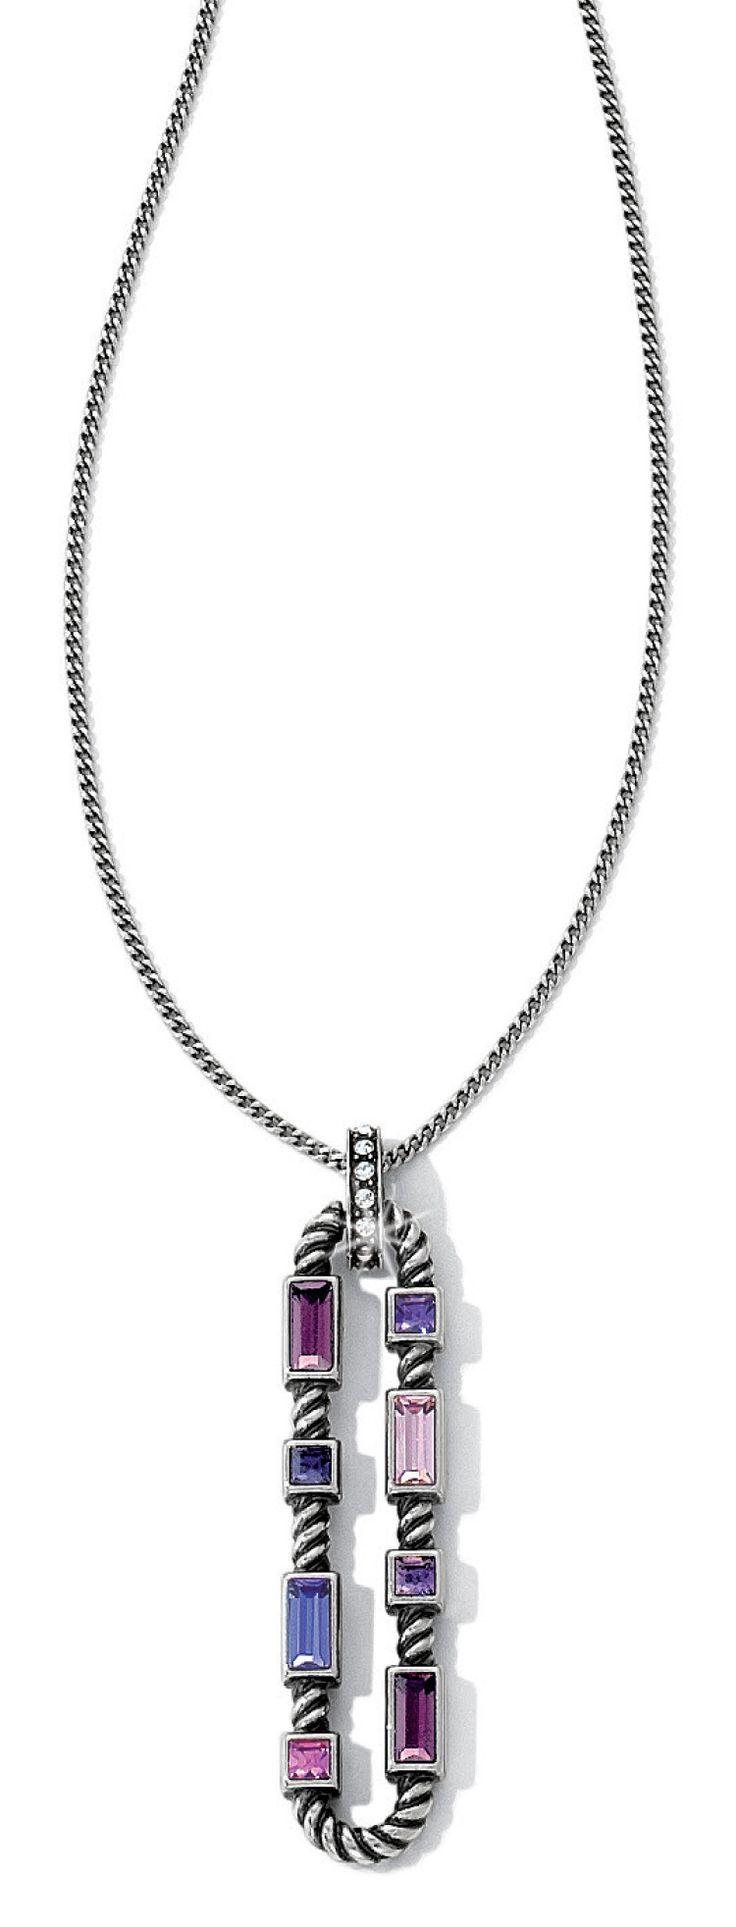 The Moderna Convertible Necklace